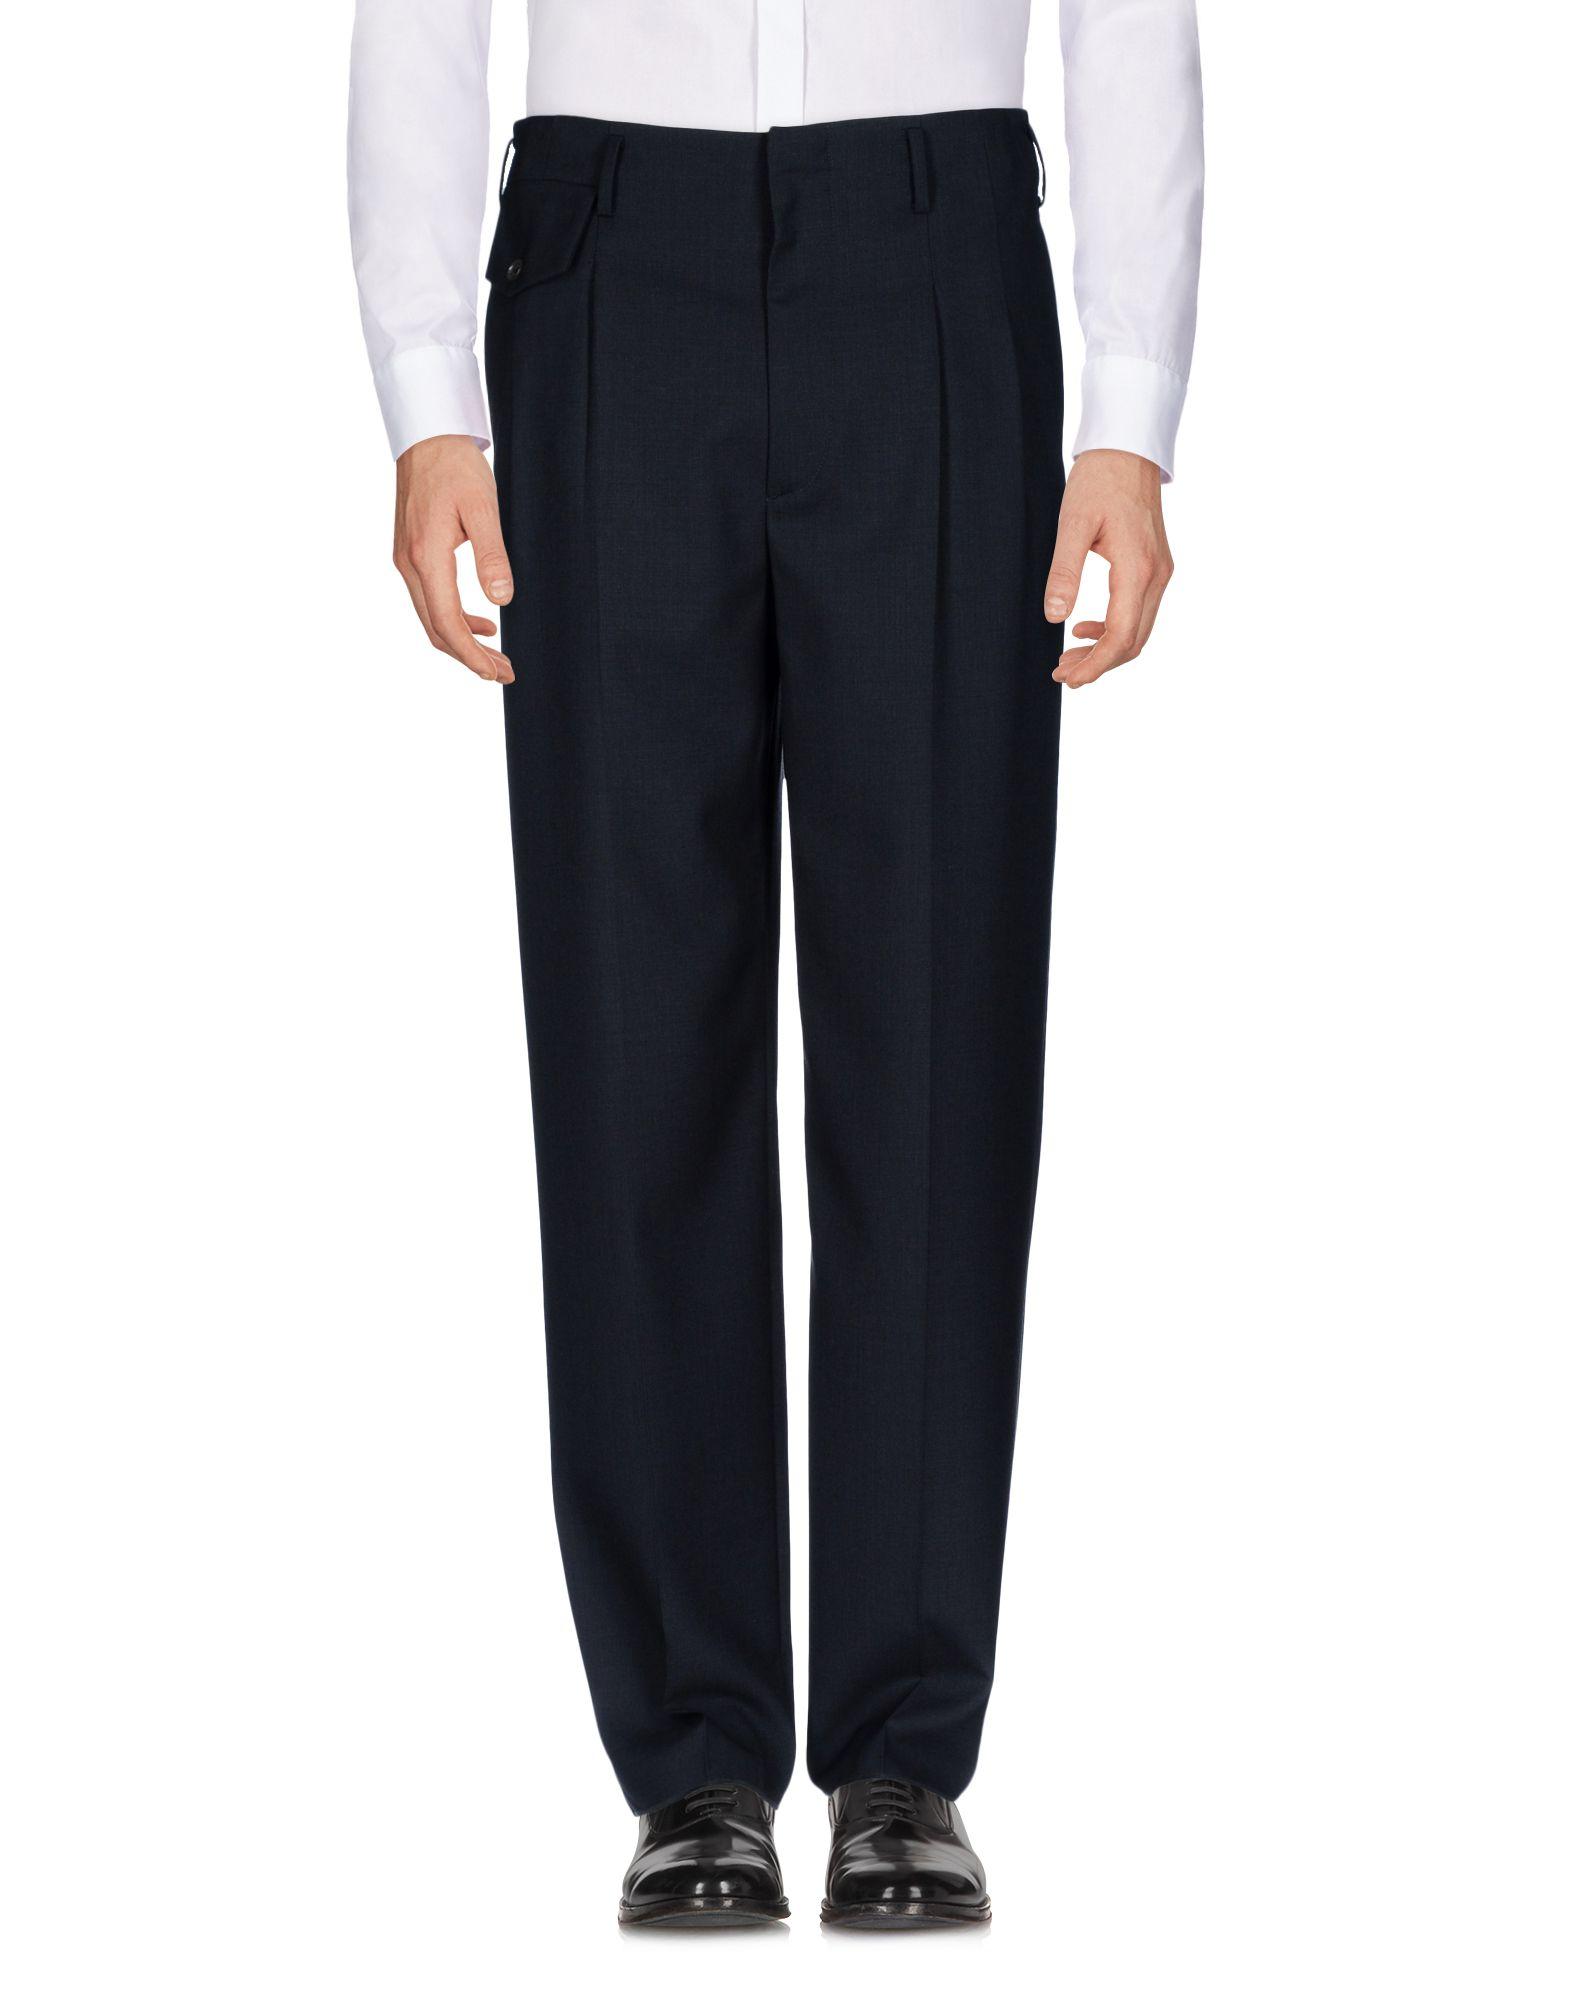 Pantalone Golden Goose Deluxe Brand Donna - Acquista online su